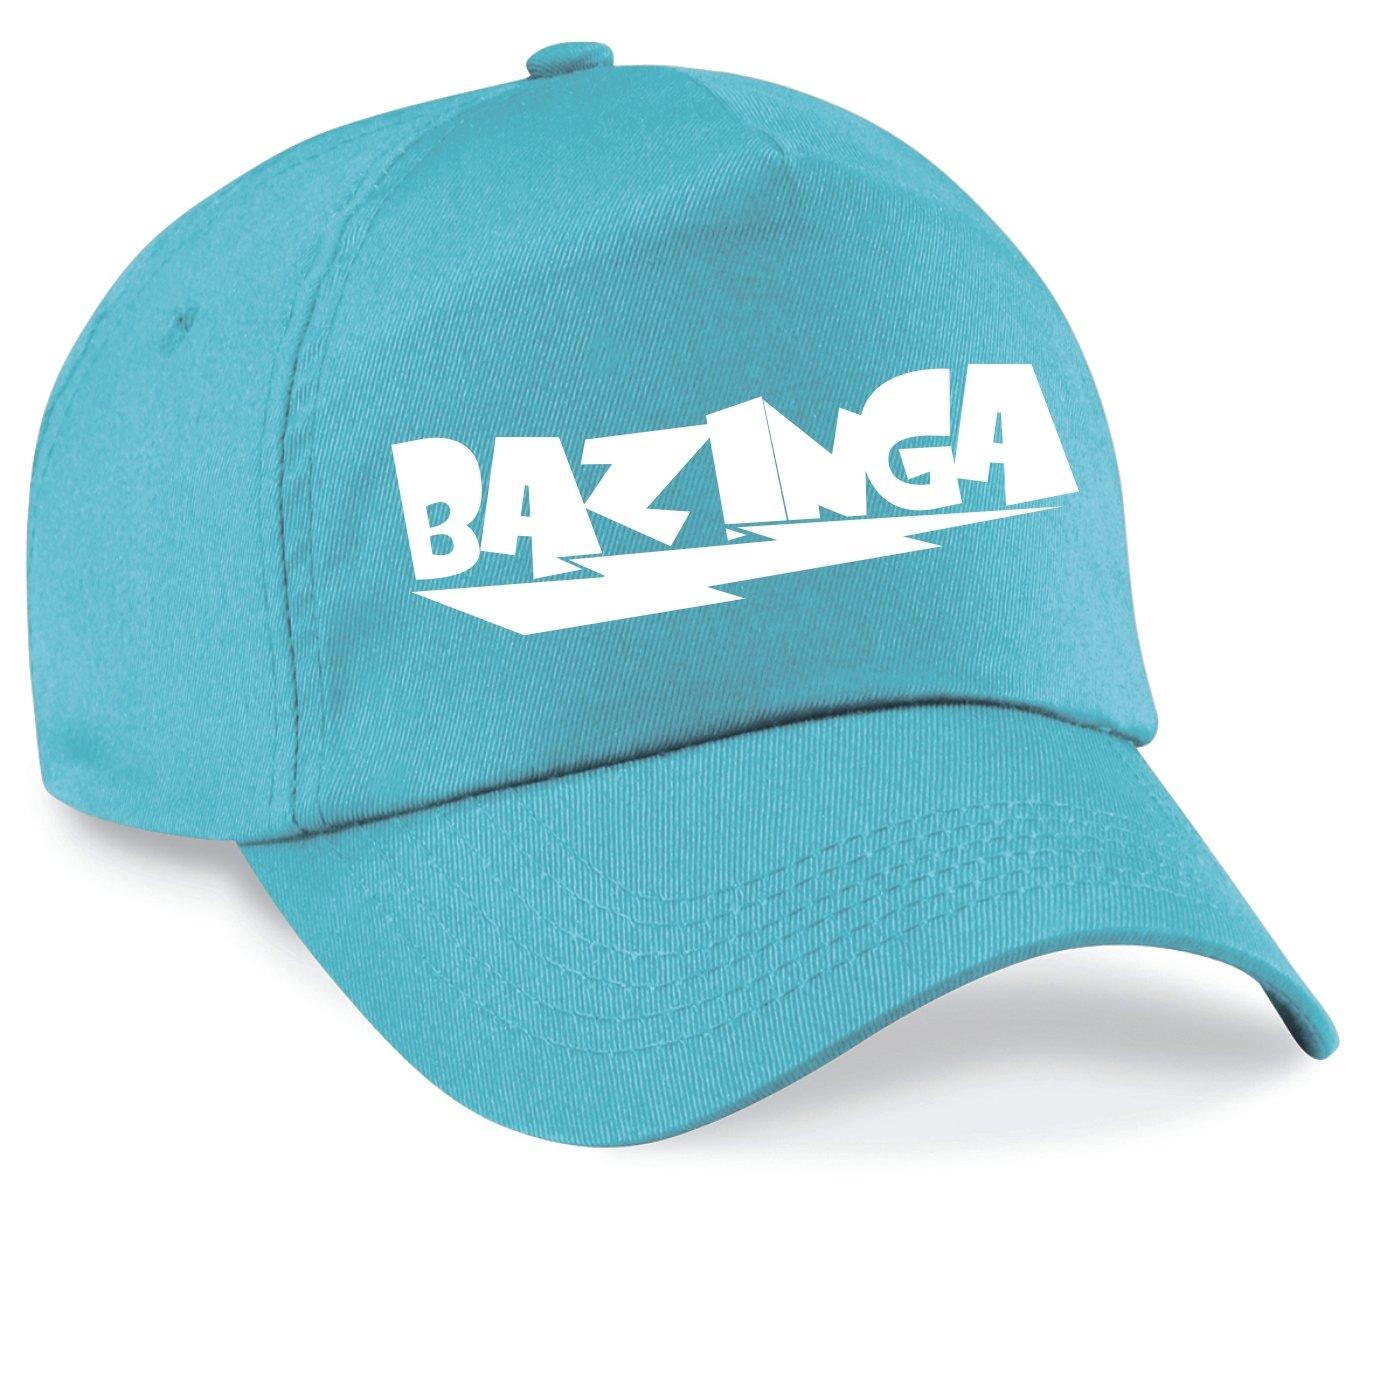 Shirtinstyle Gorra Béisbol Bazinga Movie Estilo Gorra Capy Grande ...